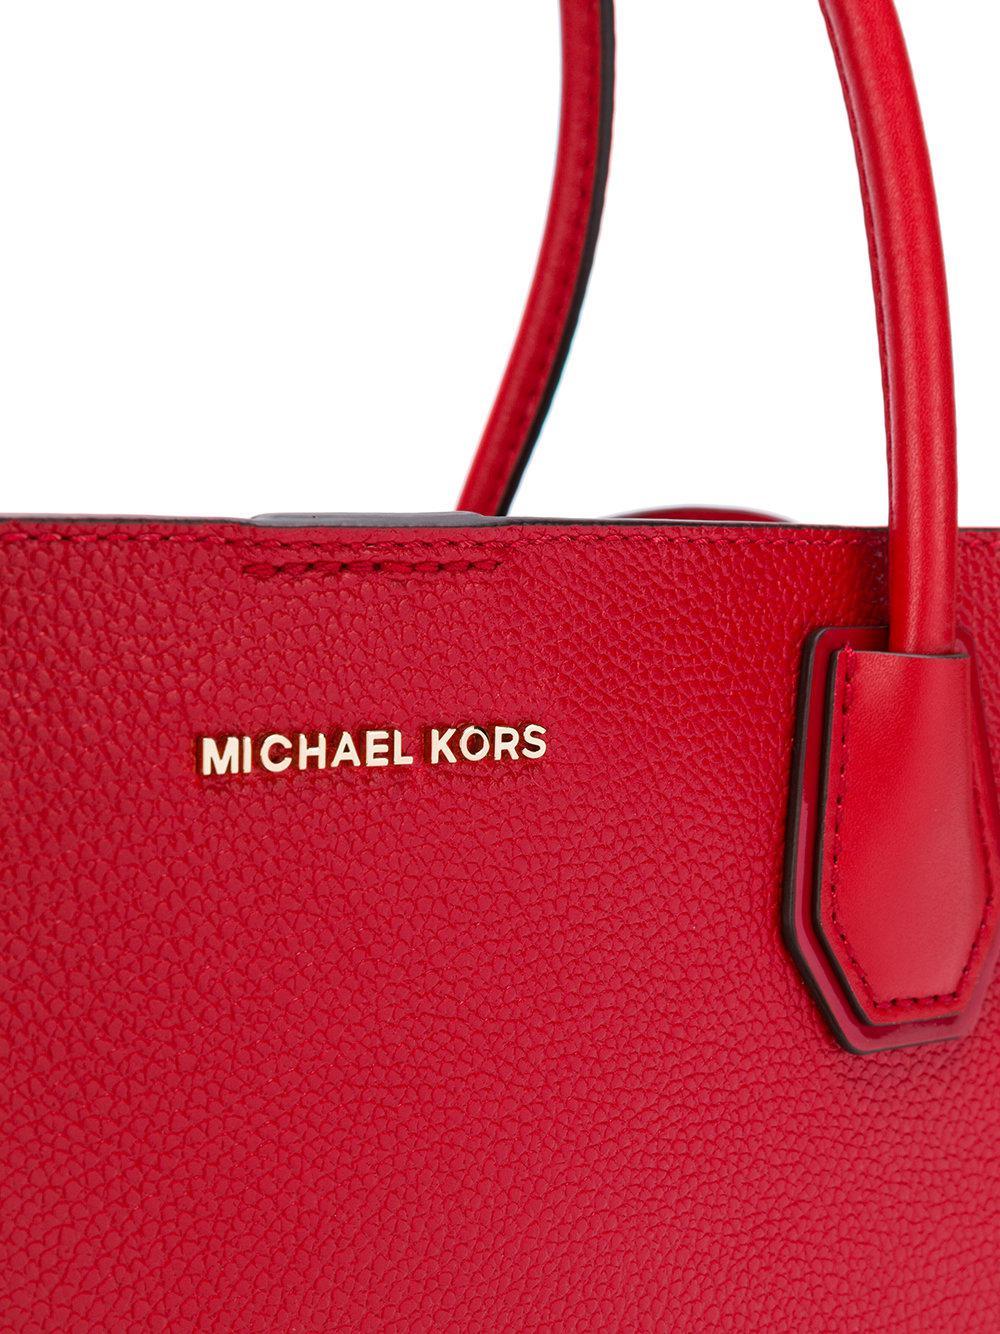 MICHAEL Michael Kors Leather Padlock Tote in Red